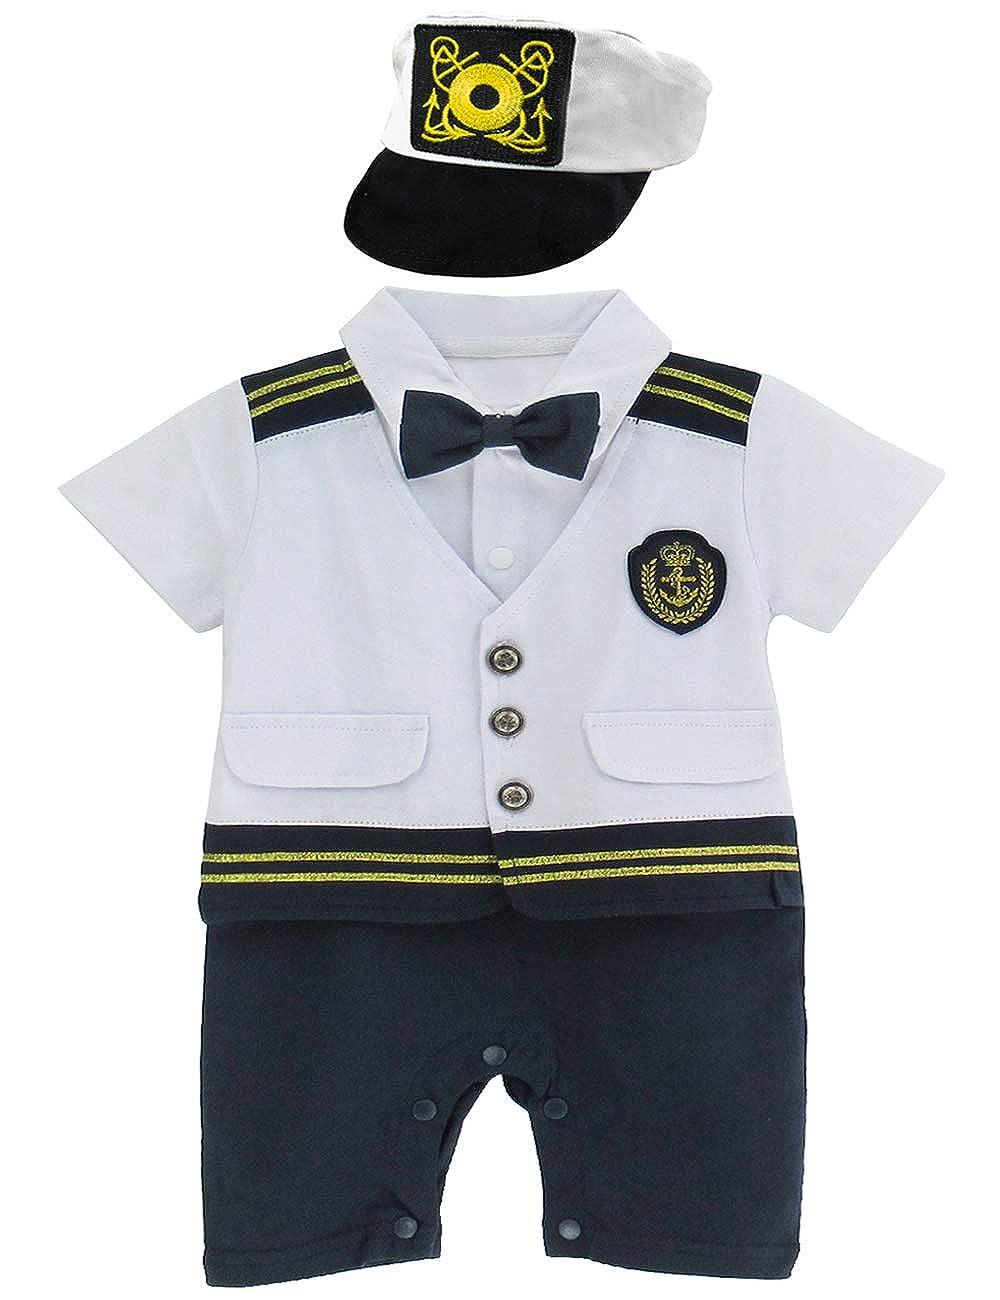 321819fa0 Amazon.com  A J DESIGN Baby Boys  Halloween Captain Costume Romper ...